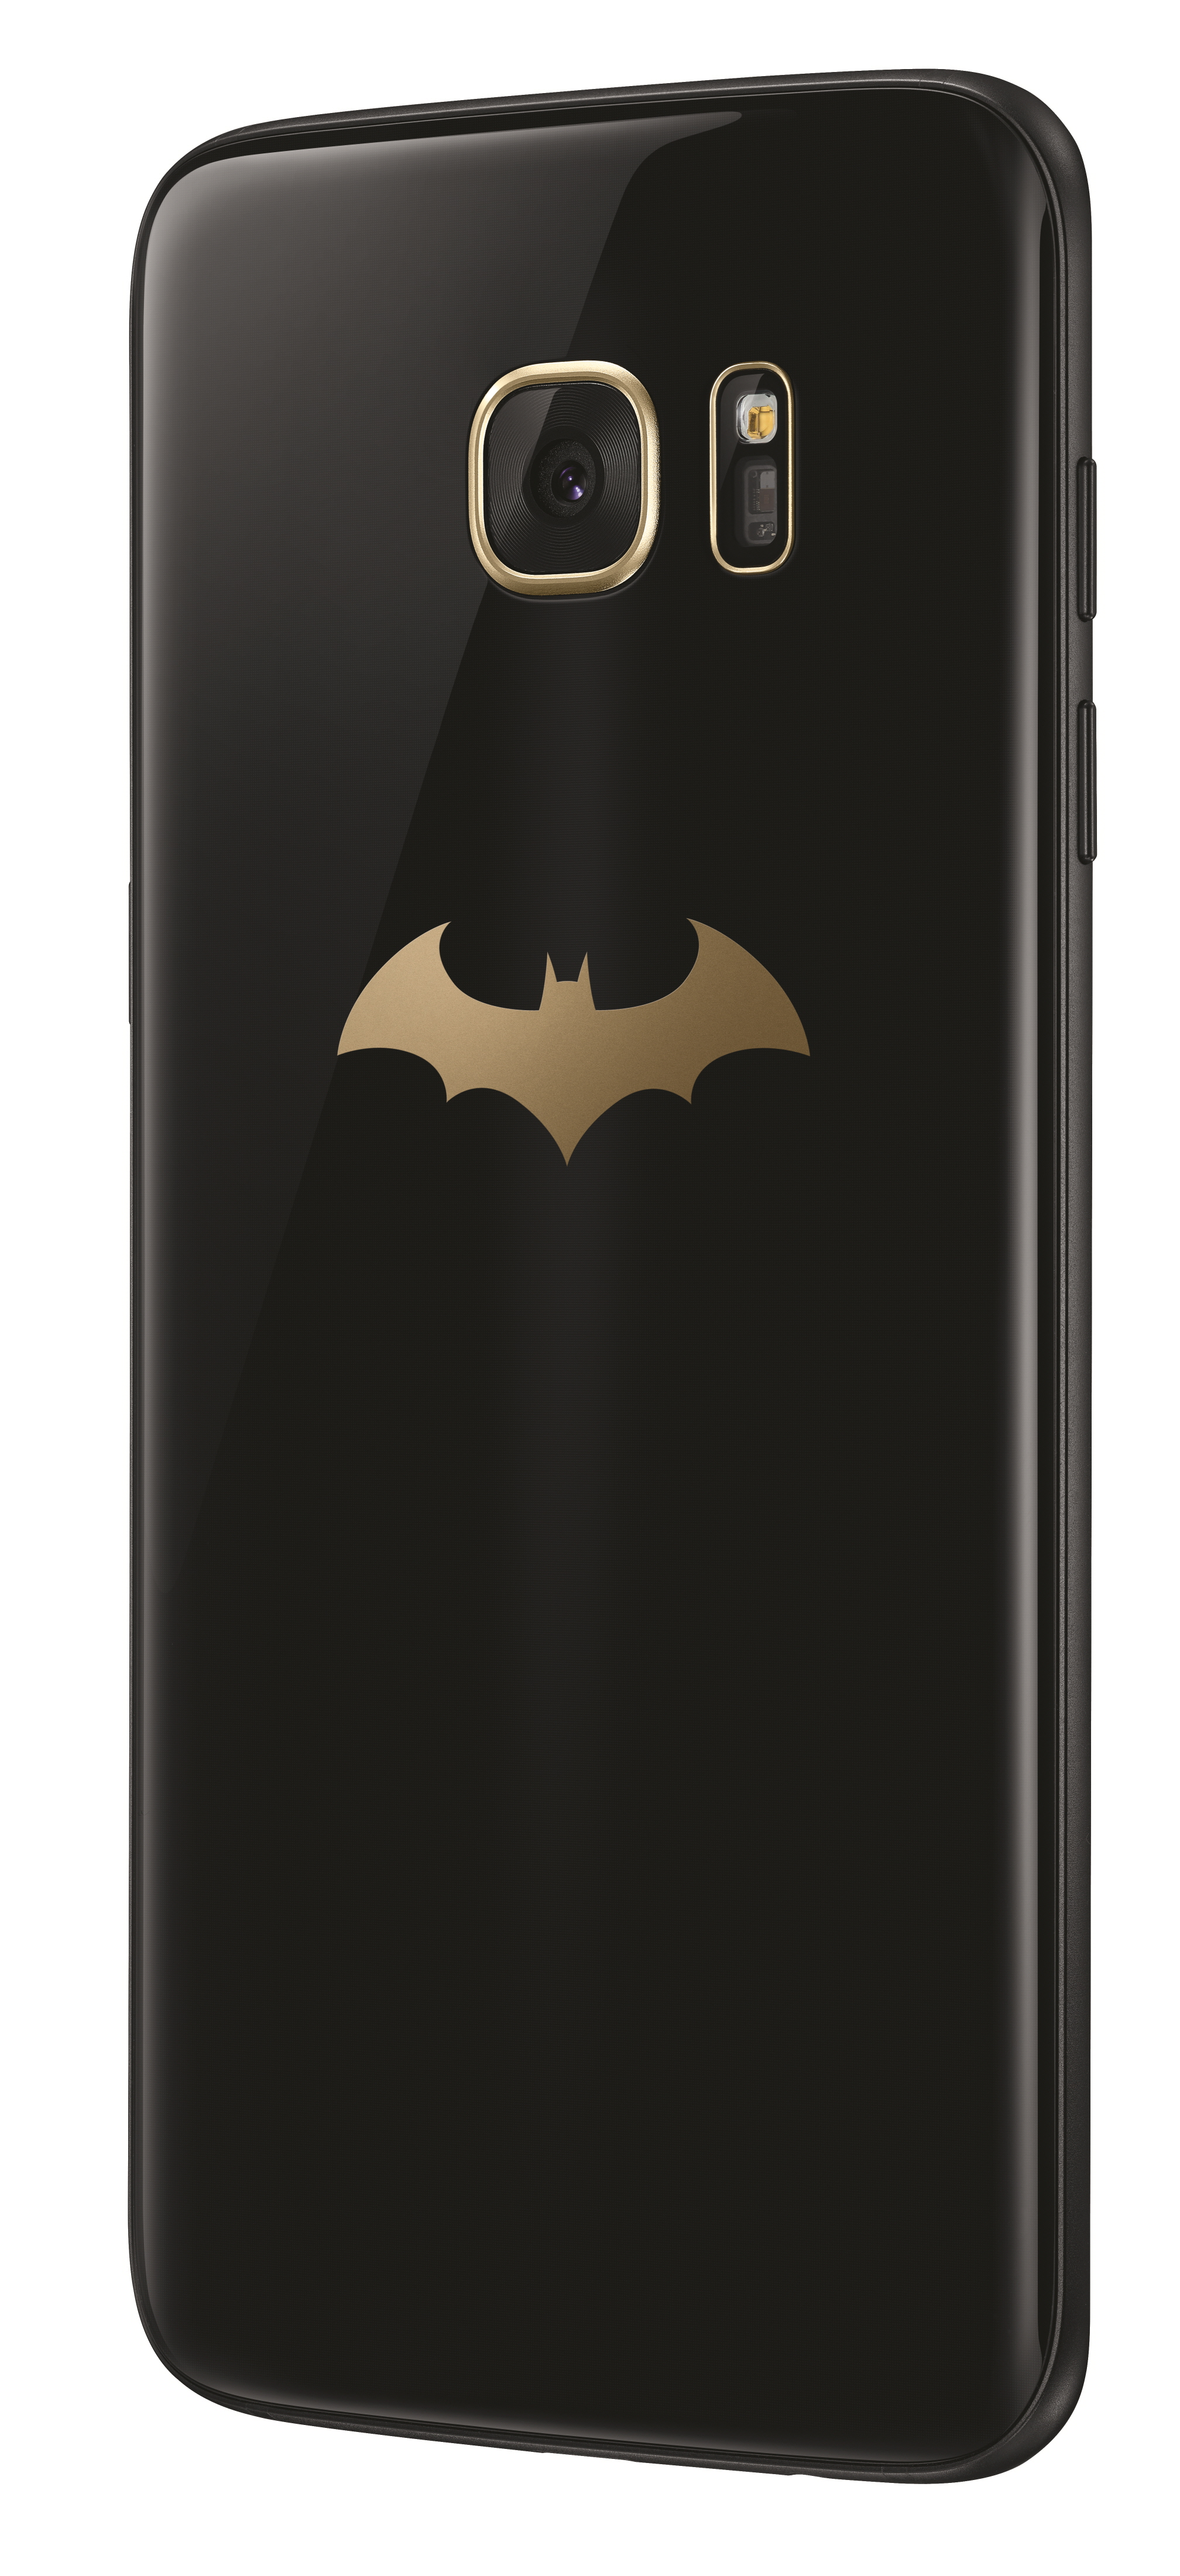 info for d477e 73850 Not Even Batman Can Afford the Batman-Themed Samsung Galaxy S7 Edge